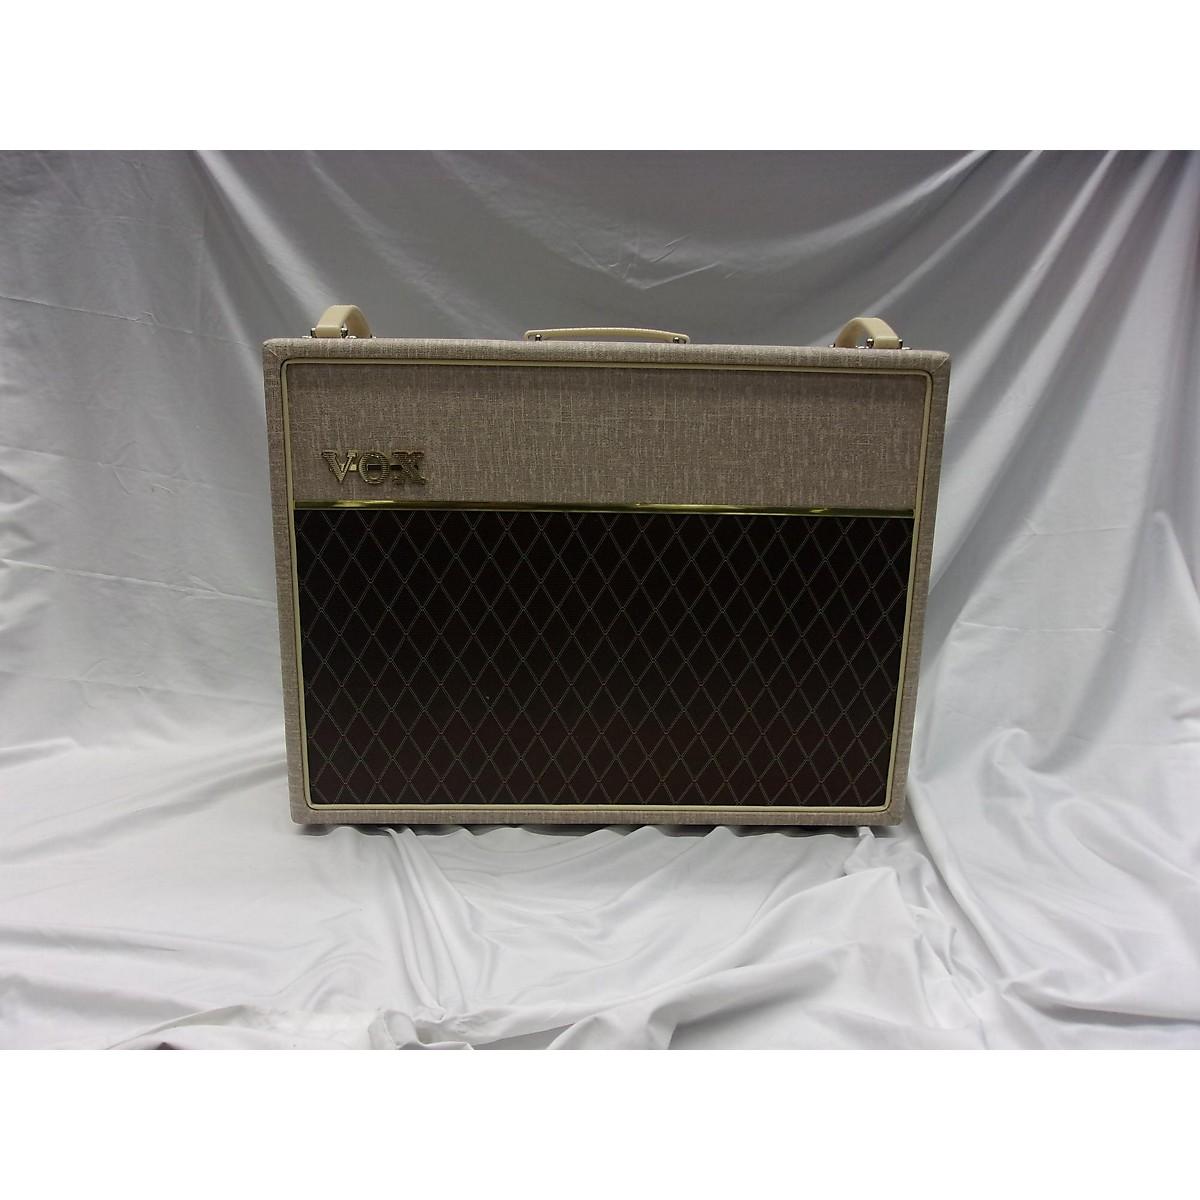 Vox AC30HW2X 2x12 30W Handwired Tube Guitar Combo Amp